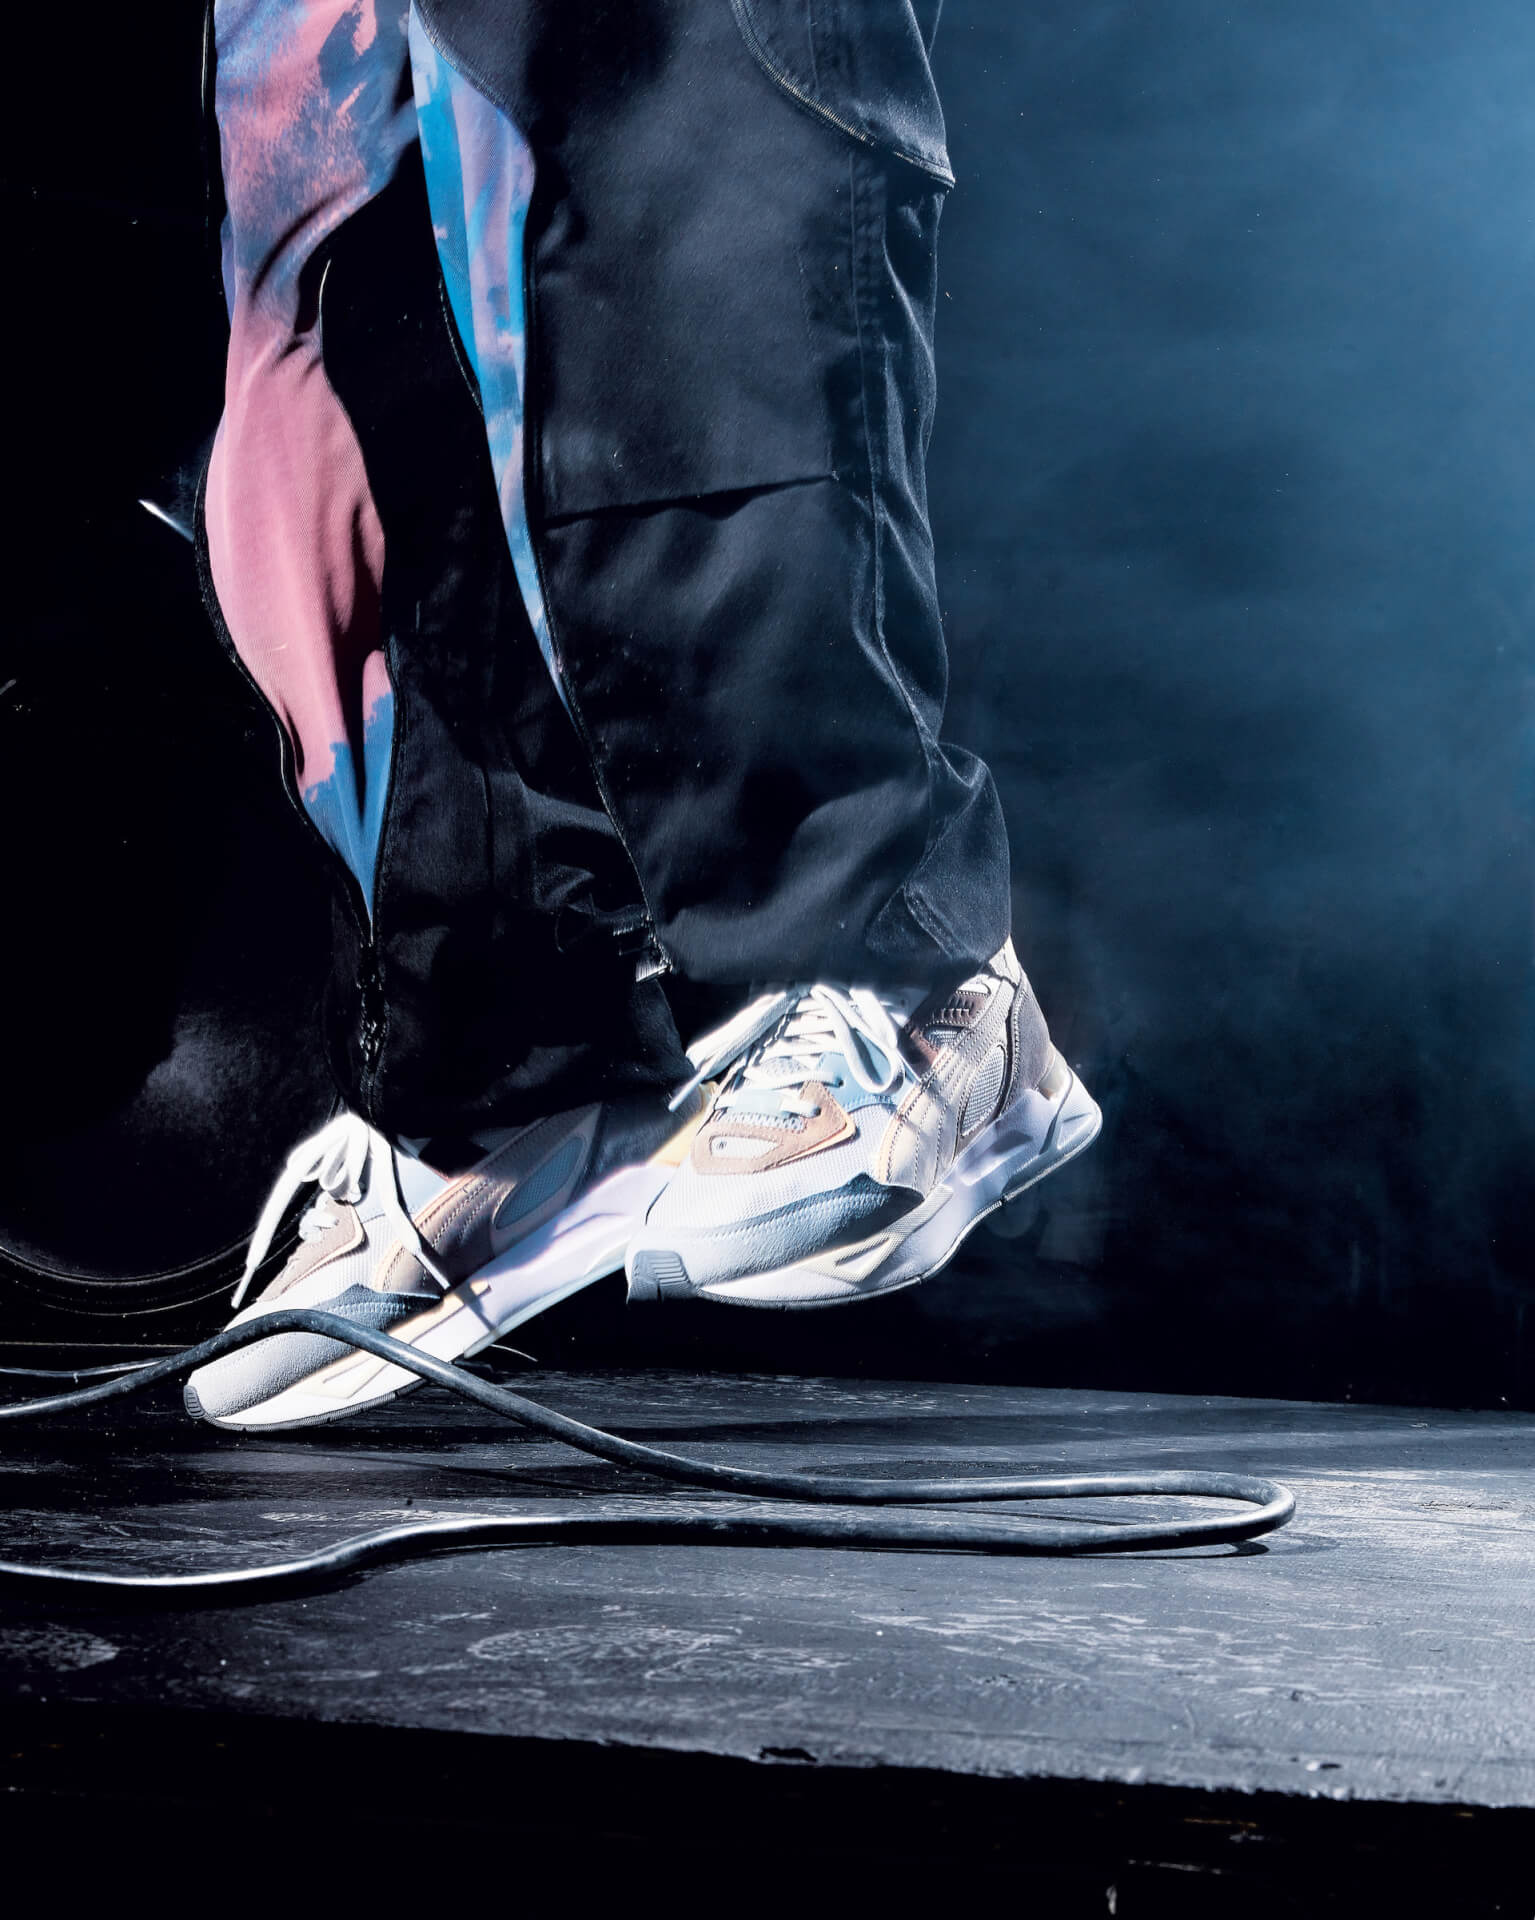 DJカルチャーからインスパイアされたプーマの2021秋冬新作スニーカー「プーマ ミラージュ スポーツ」が発売決定! life210604_puma_mirage_11